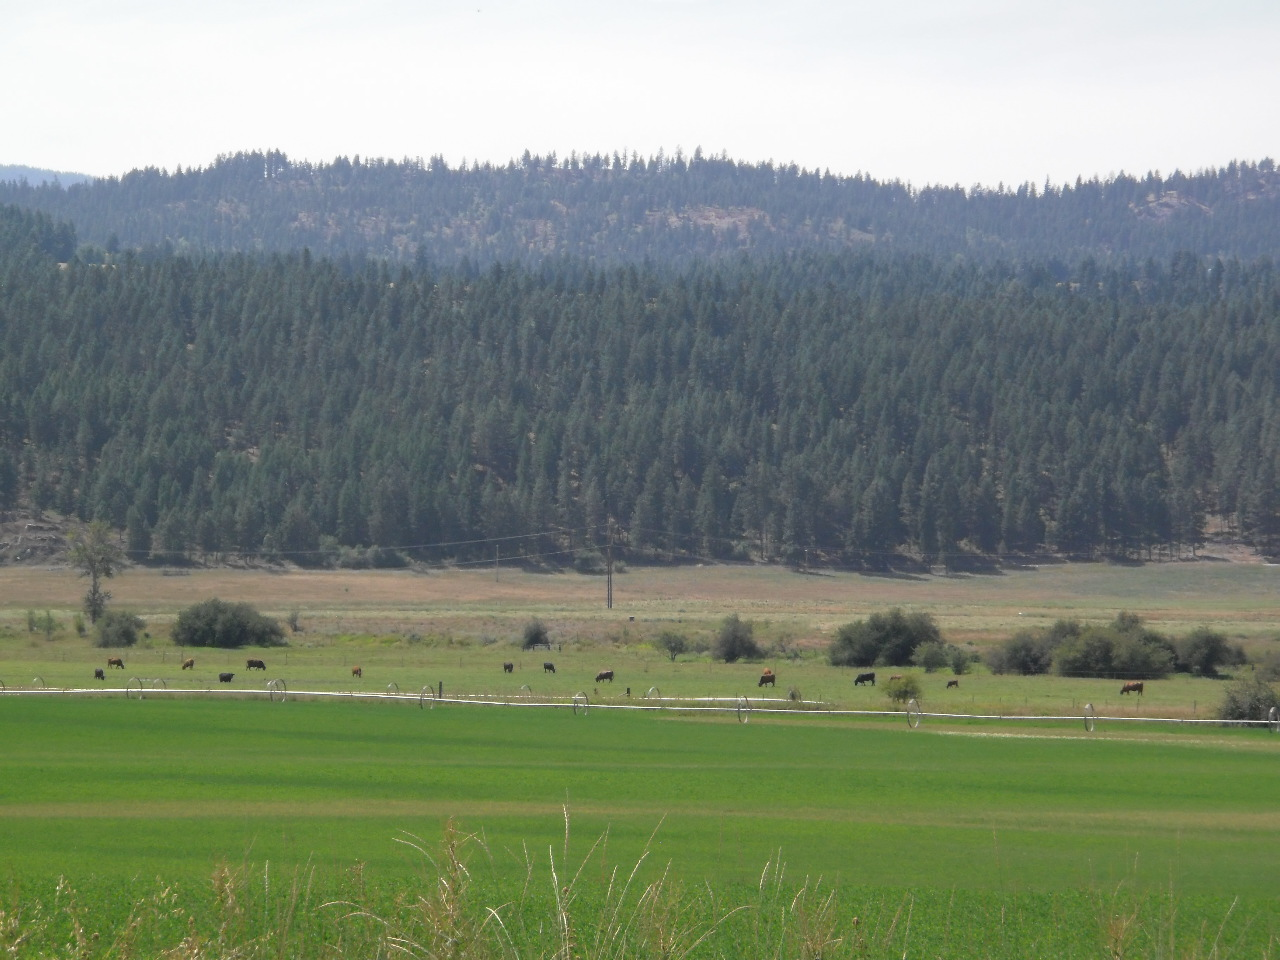 Farming in Stevens County